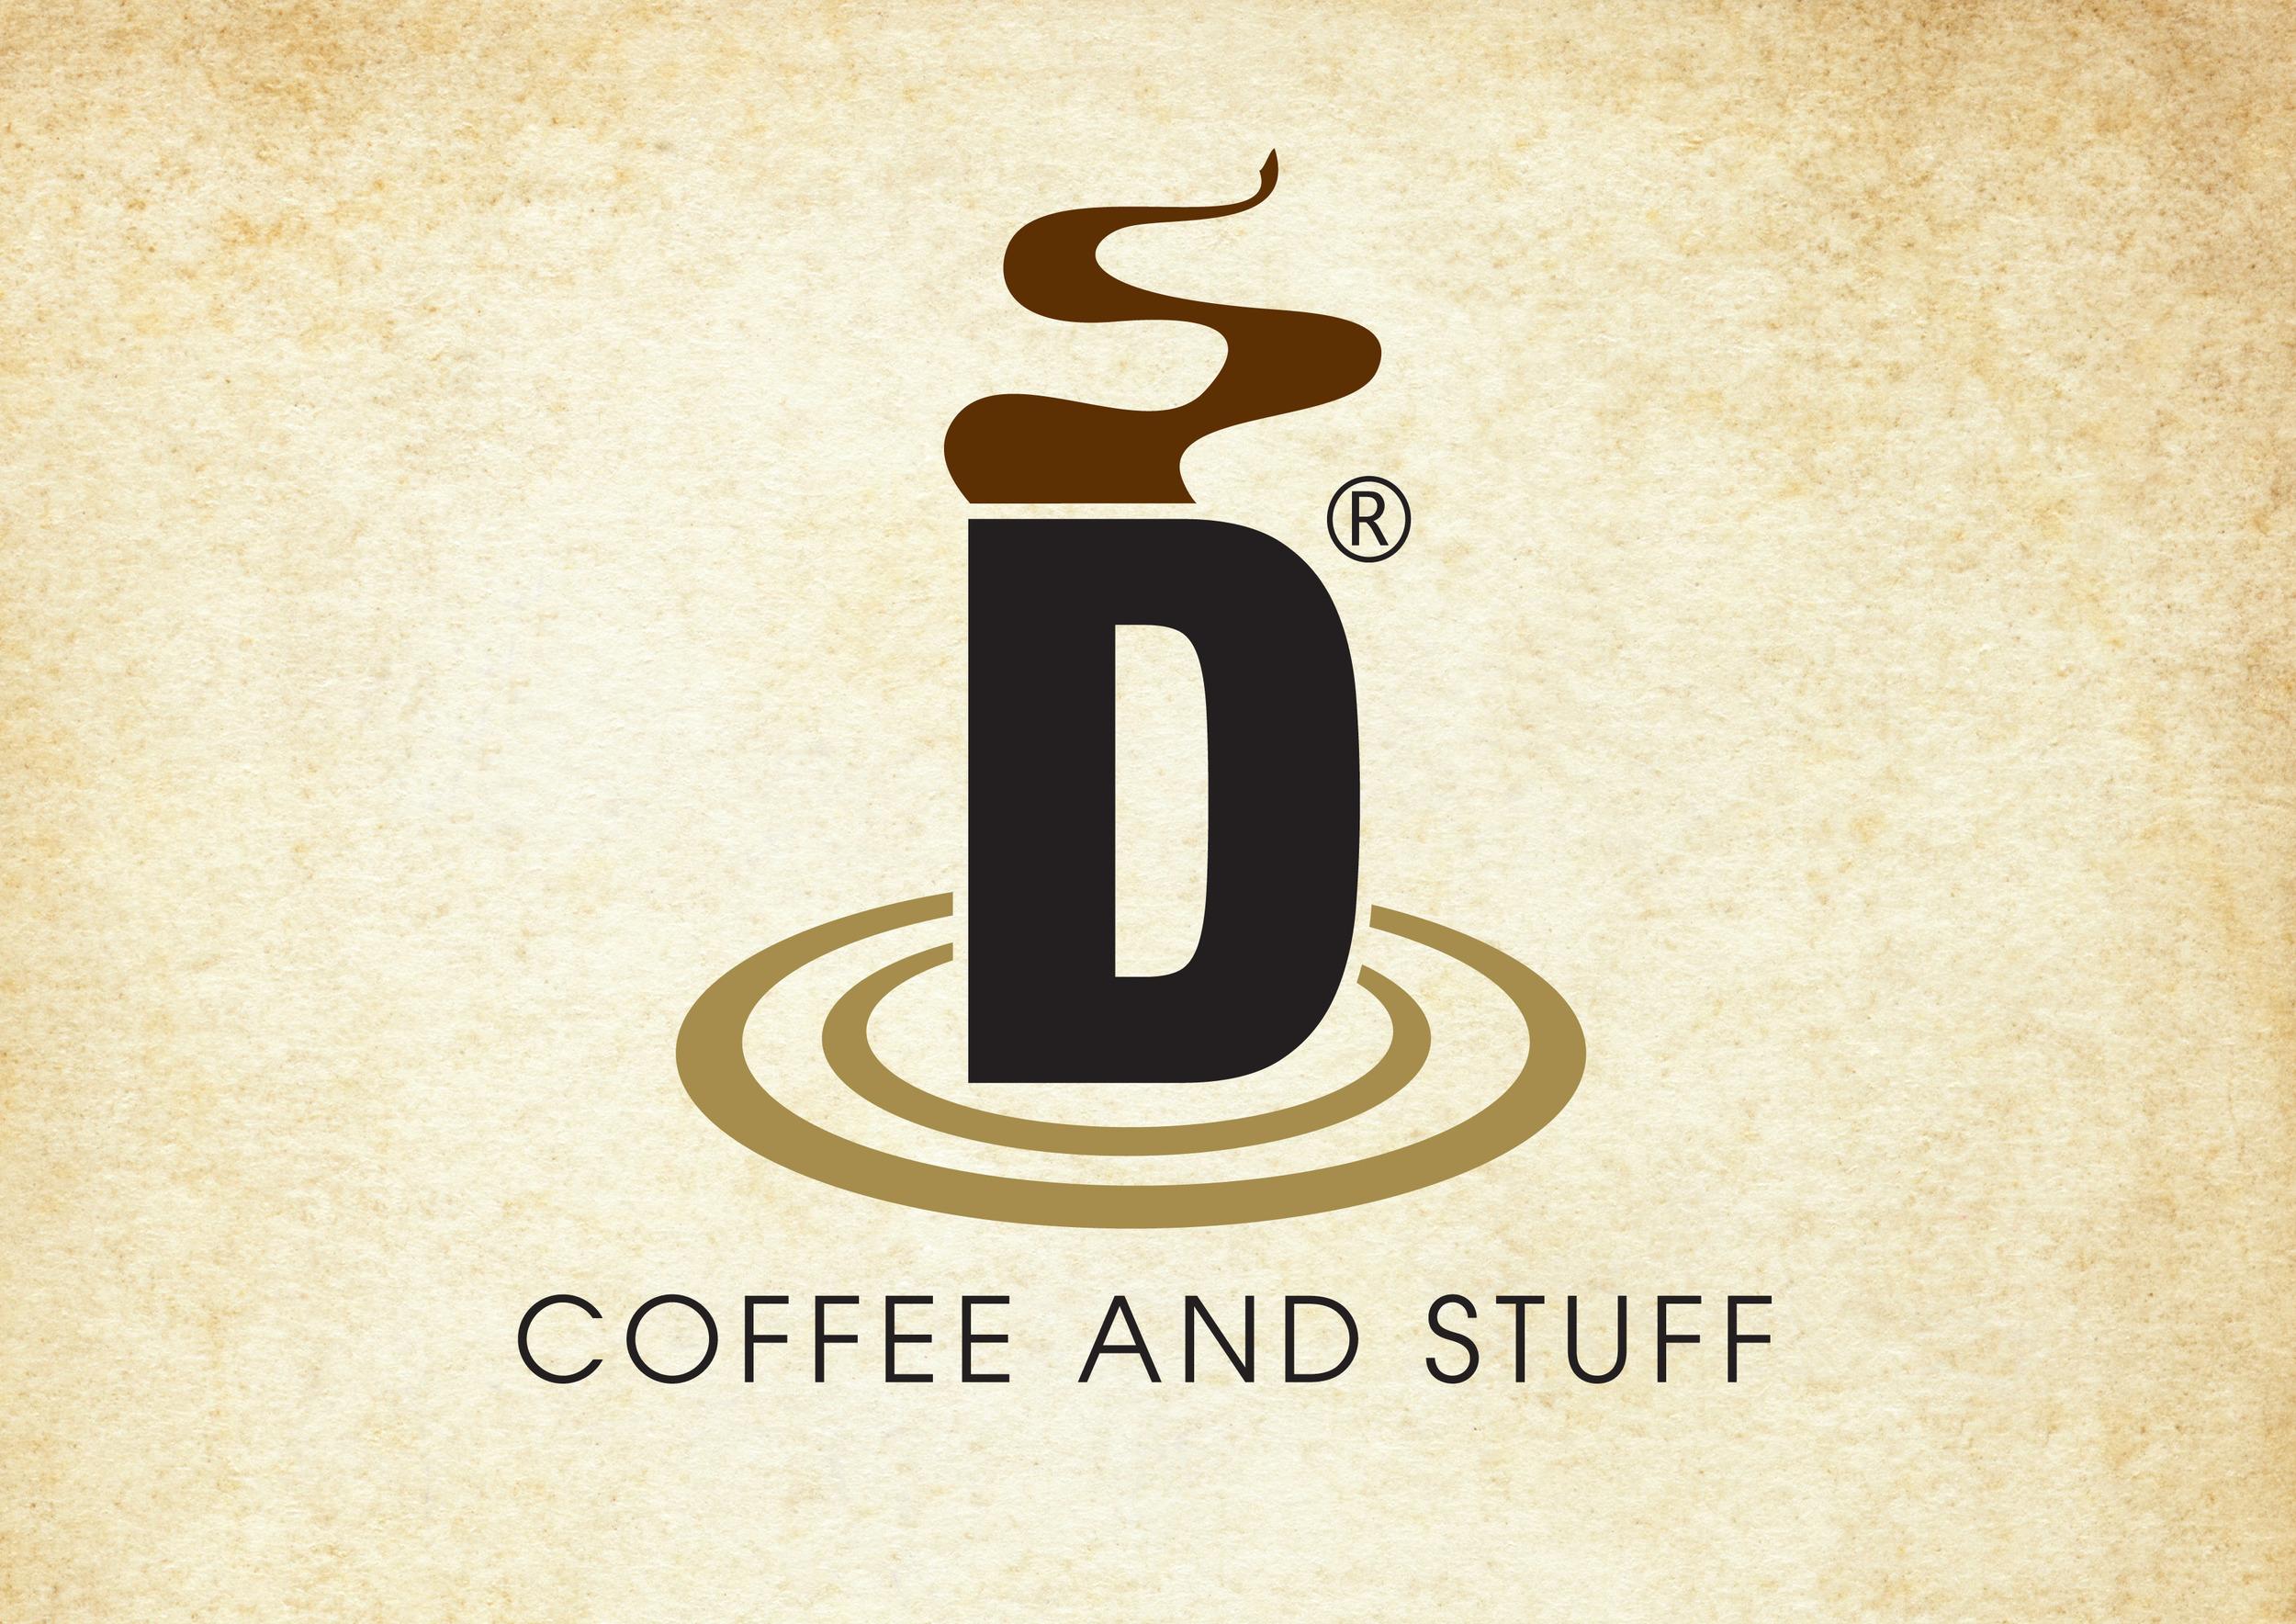 D´COFFE AND STUFF logo.jpeg